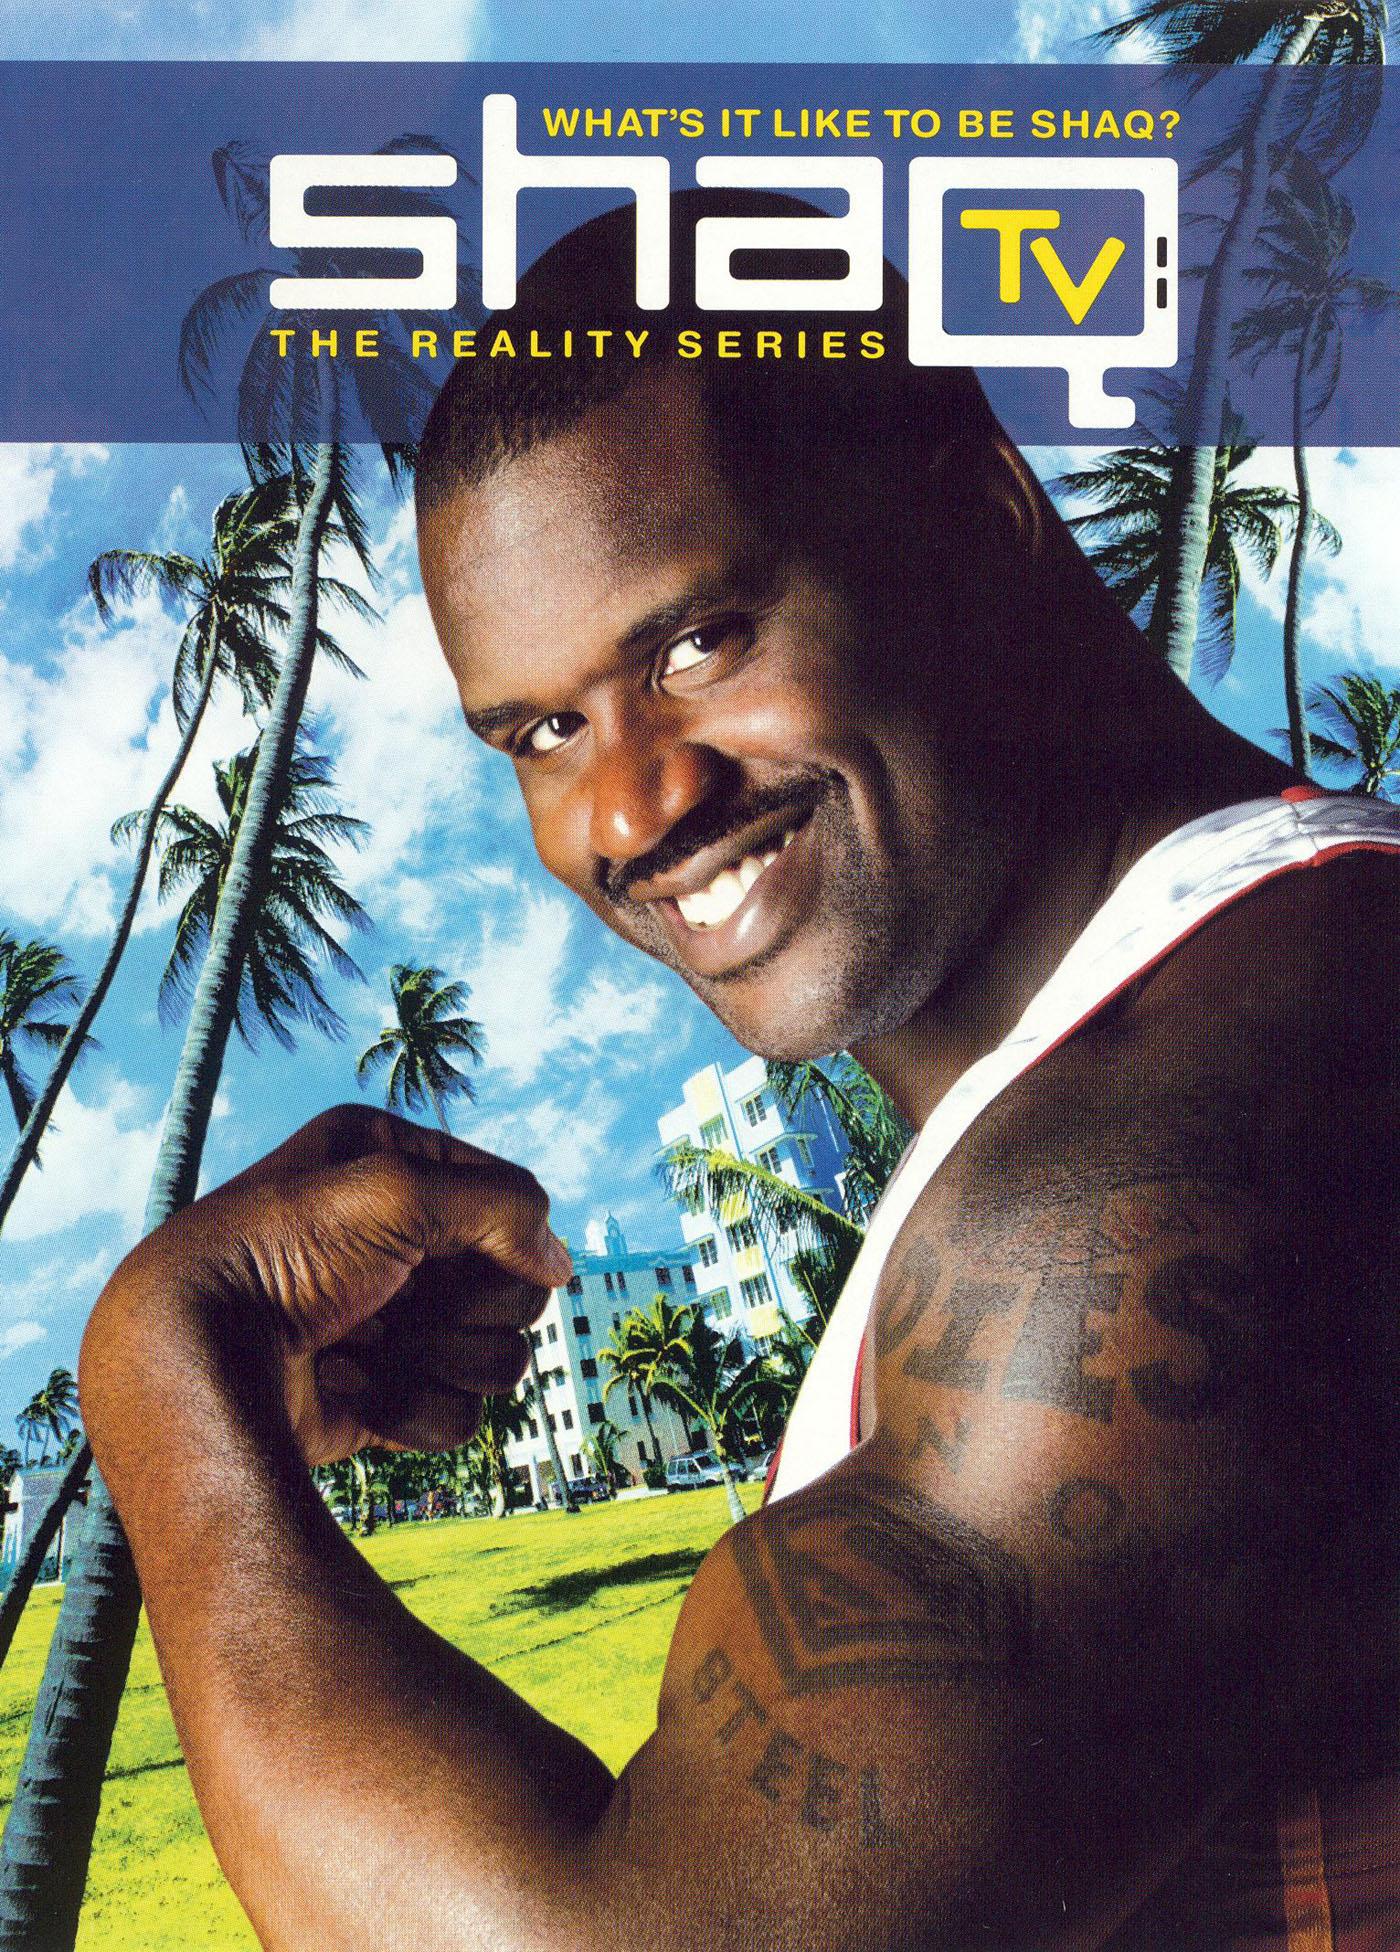 NBA: Shaq TV - The Reality Series